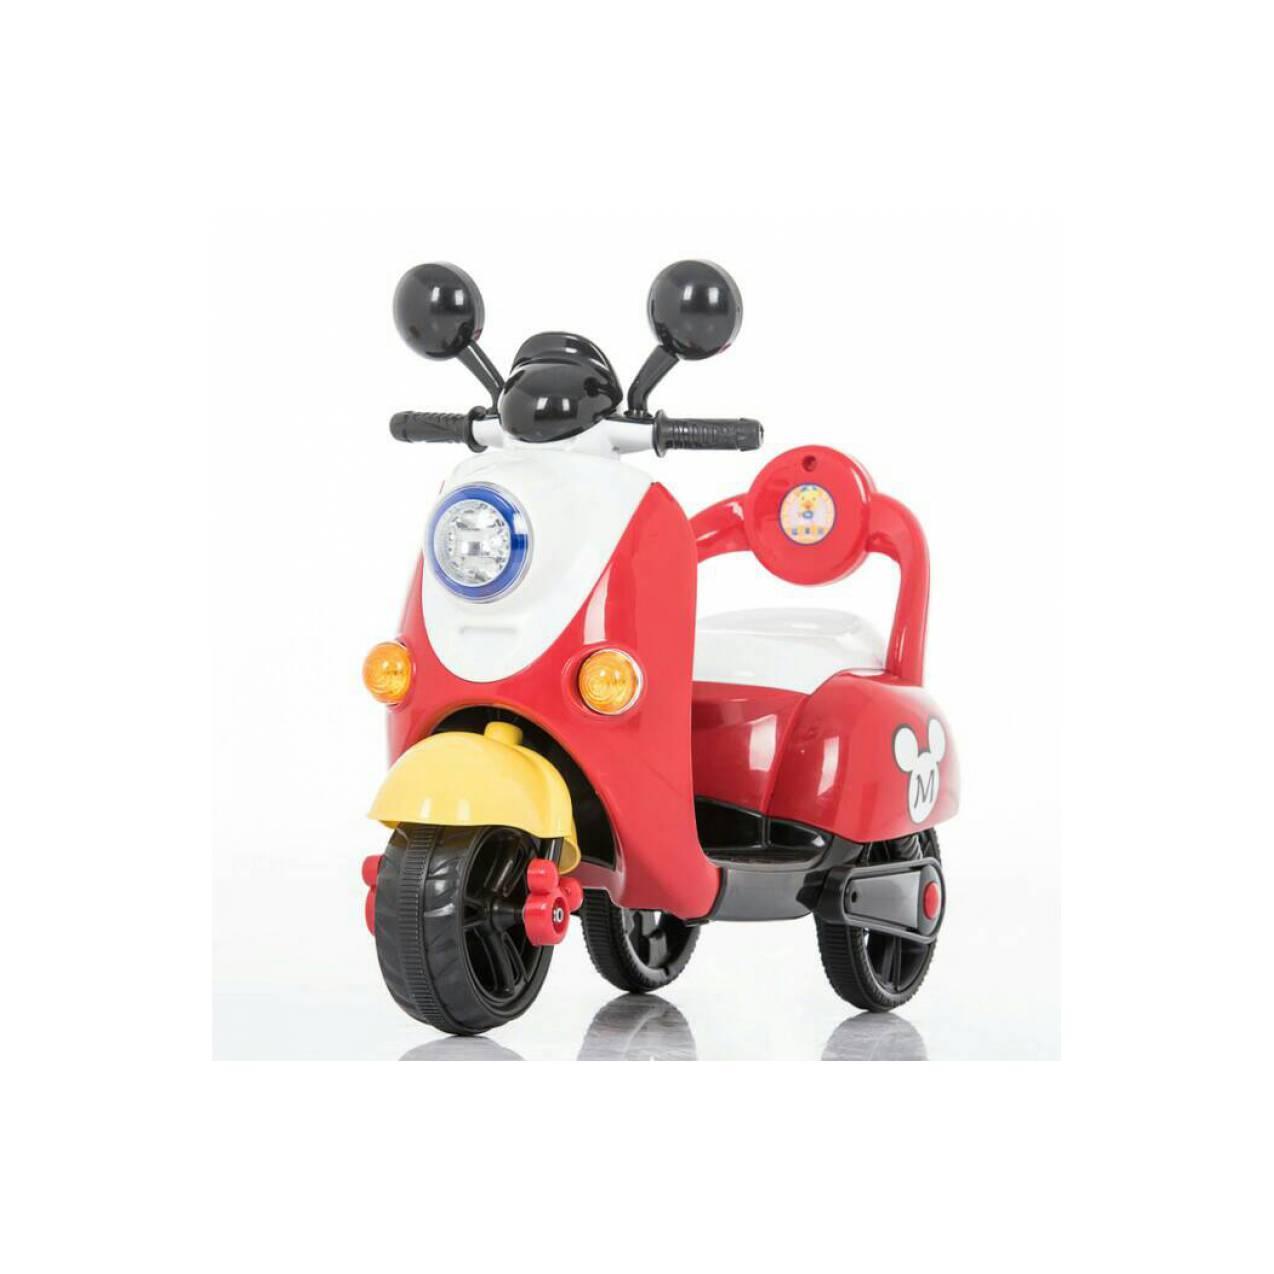 Info Harga Motor Scoopy Mainan Anak Terbaru Termurah November 2018 Pmb M338 Florry Battery Toy Motorcycle Aki Pliko Mickey